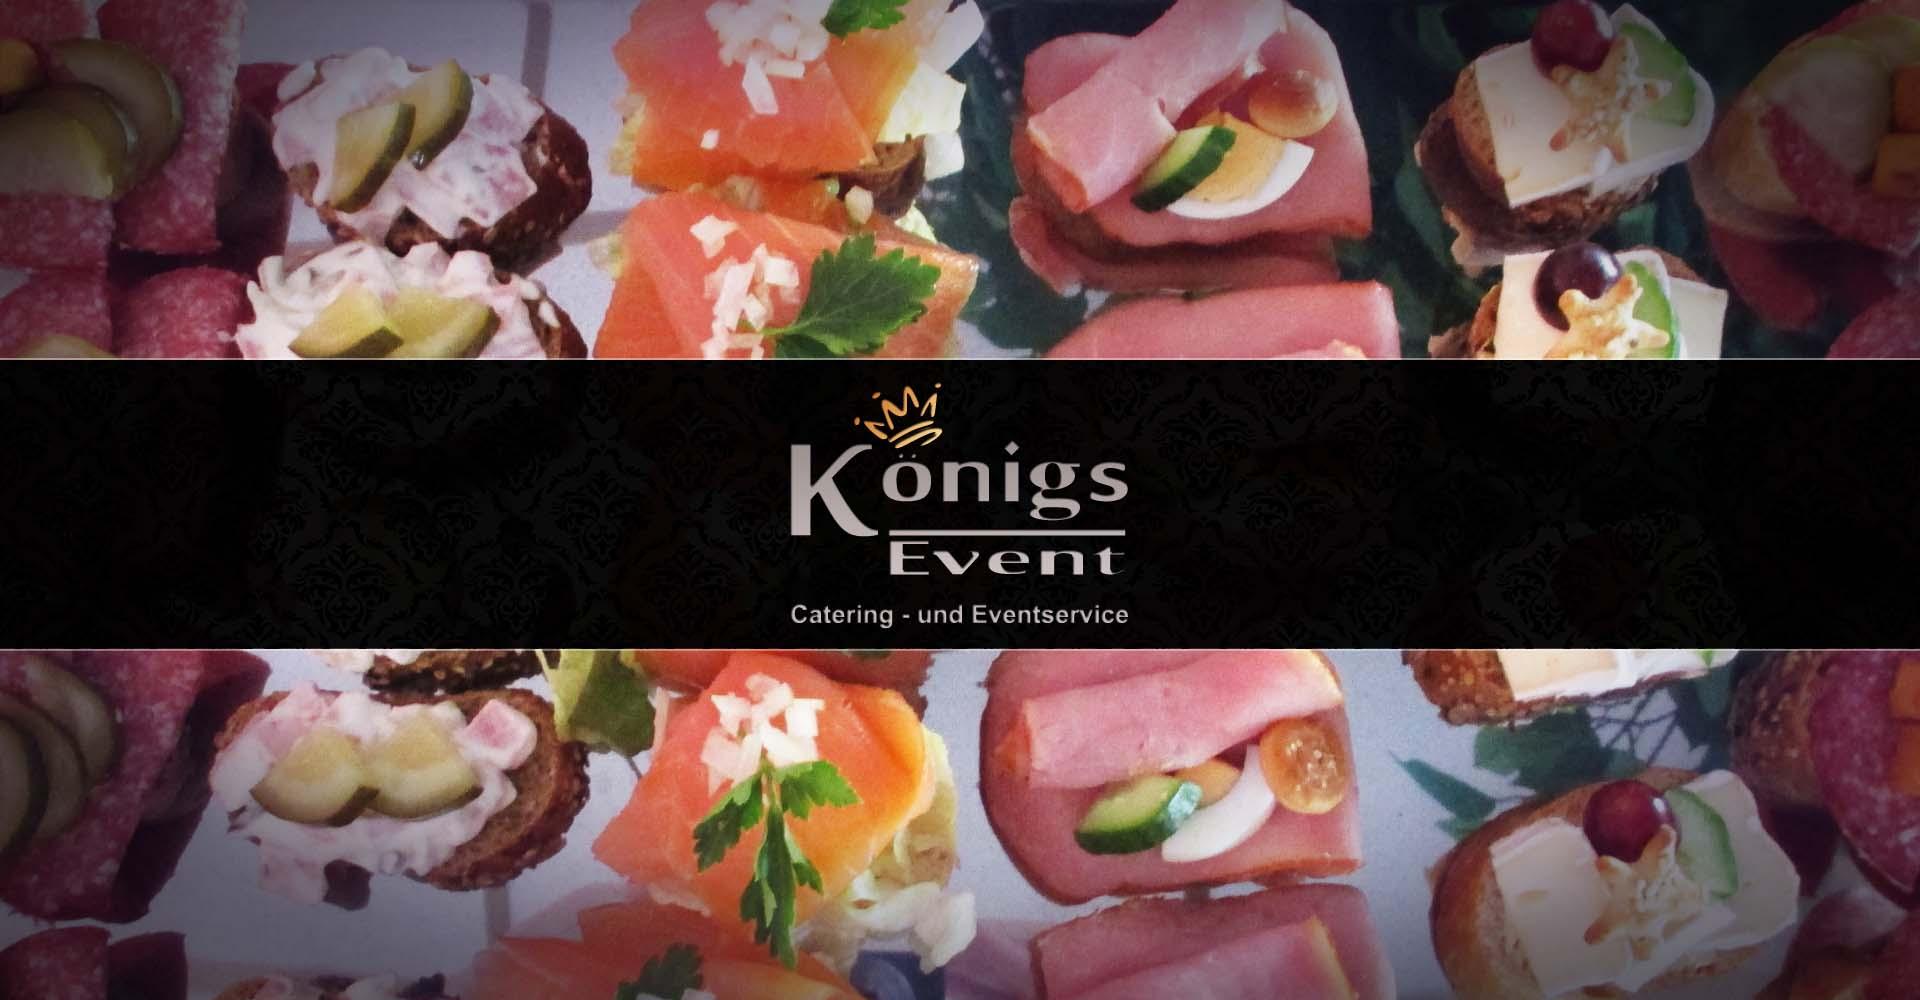 2015-05-26-Startbild-Koenigs-event-091